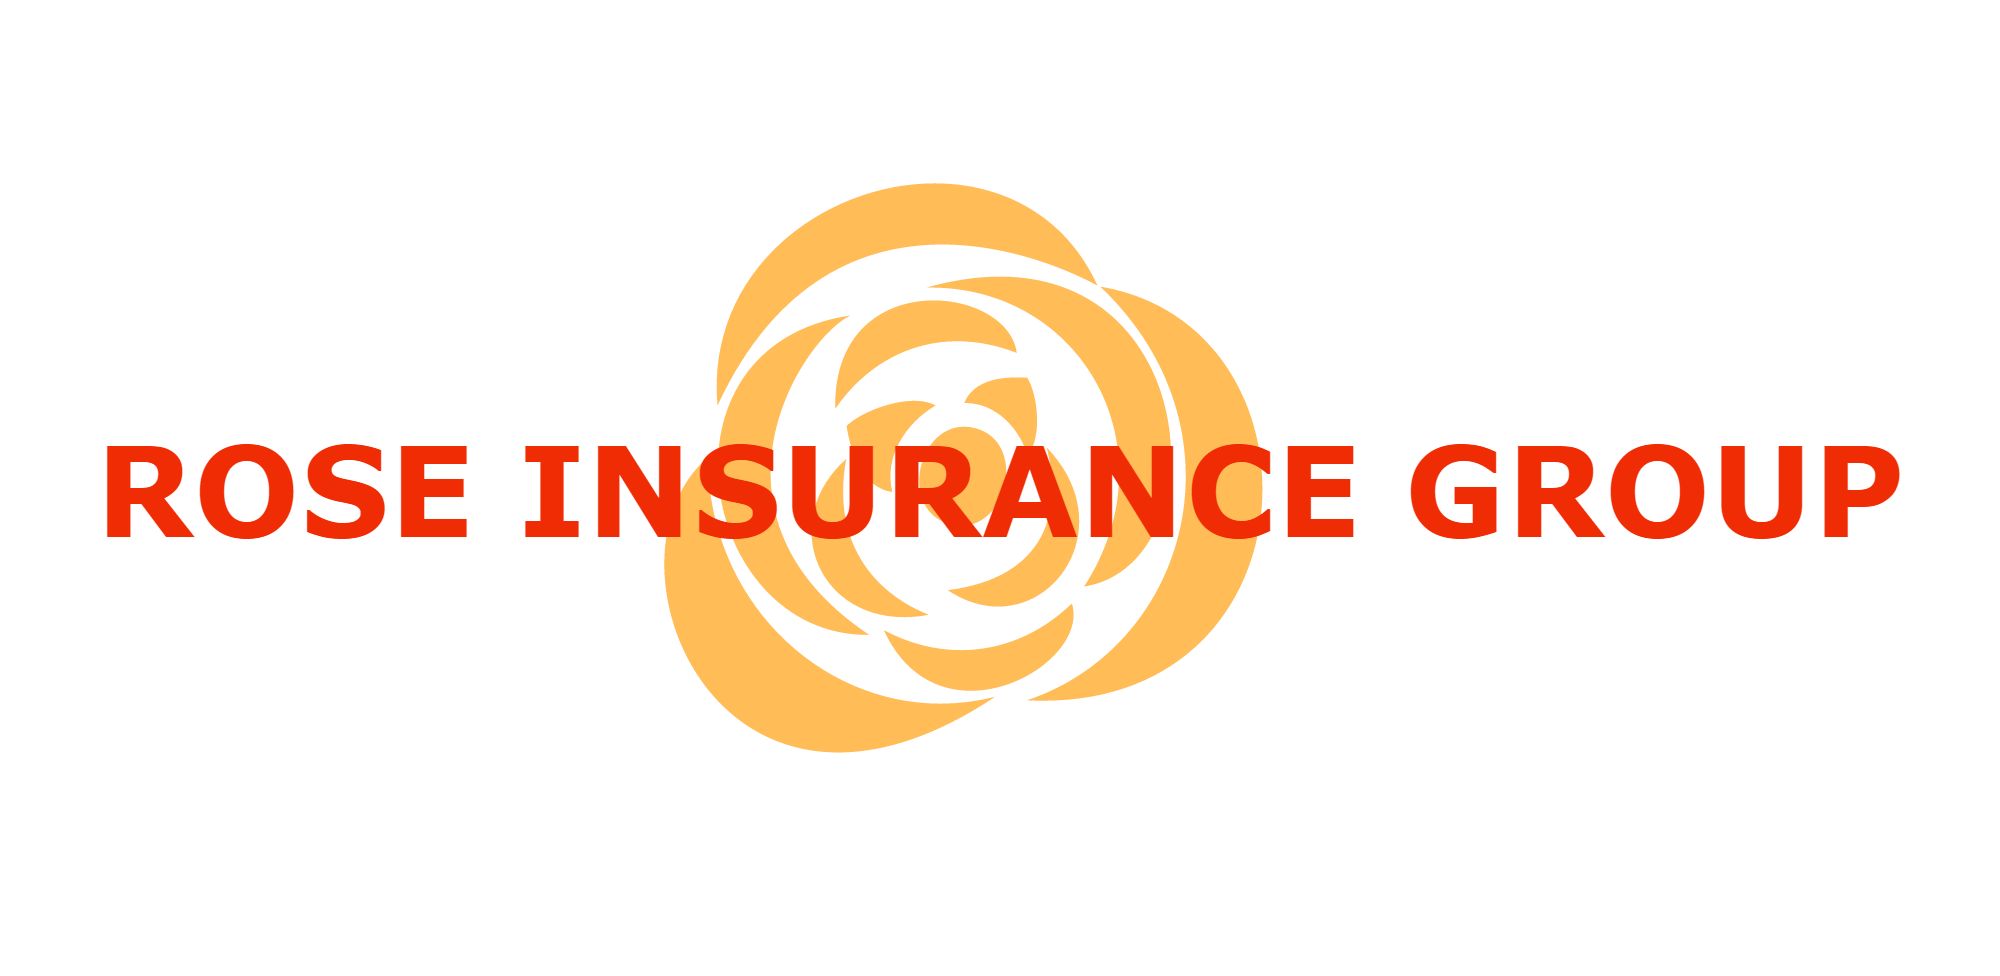 ROSE INSURANCE GROUP-logo (4).png